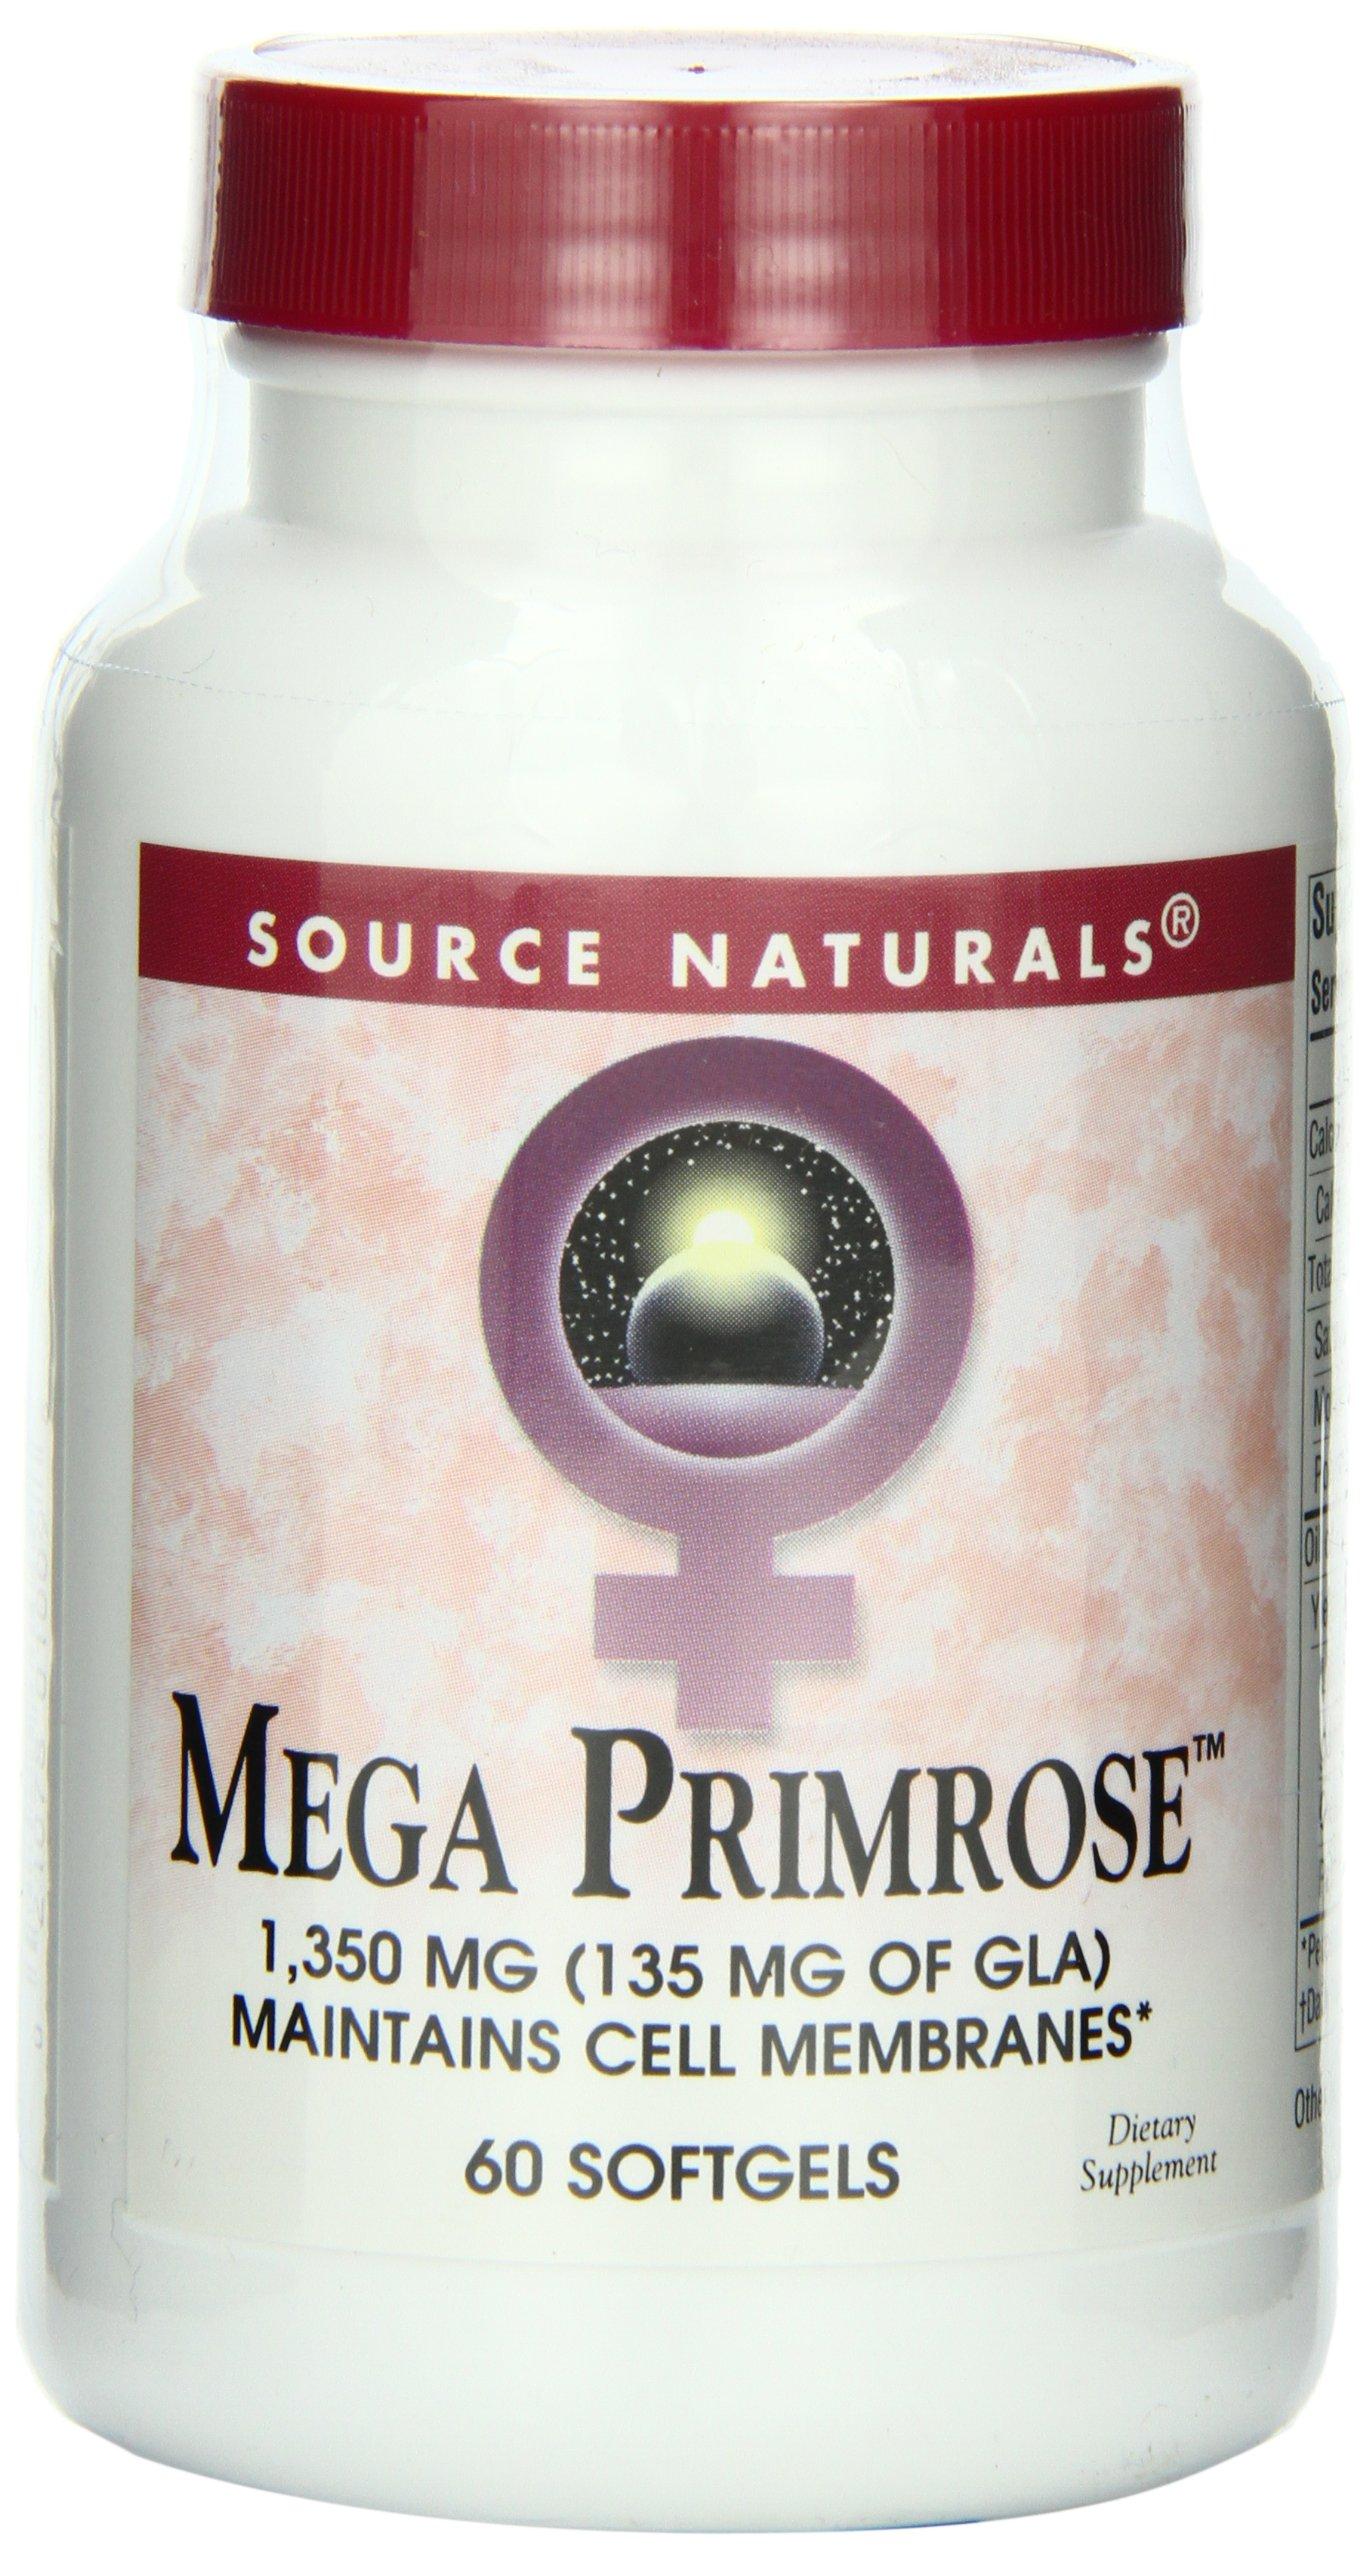 Source Naturals Mega Primrose 1350mg, Maintains Cell Membranes, 60 Softgels